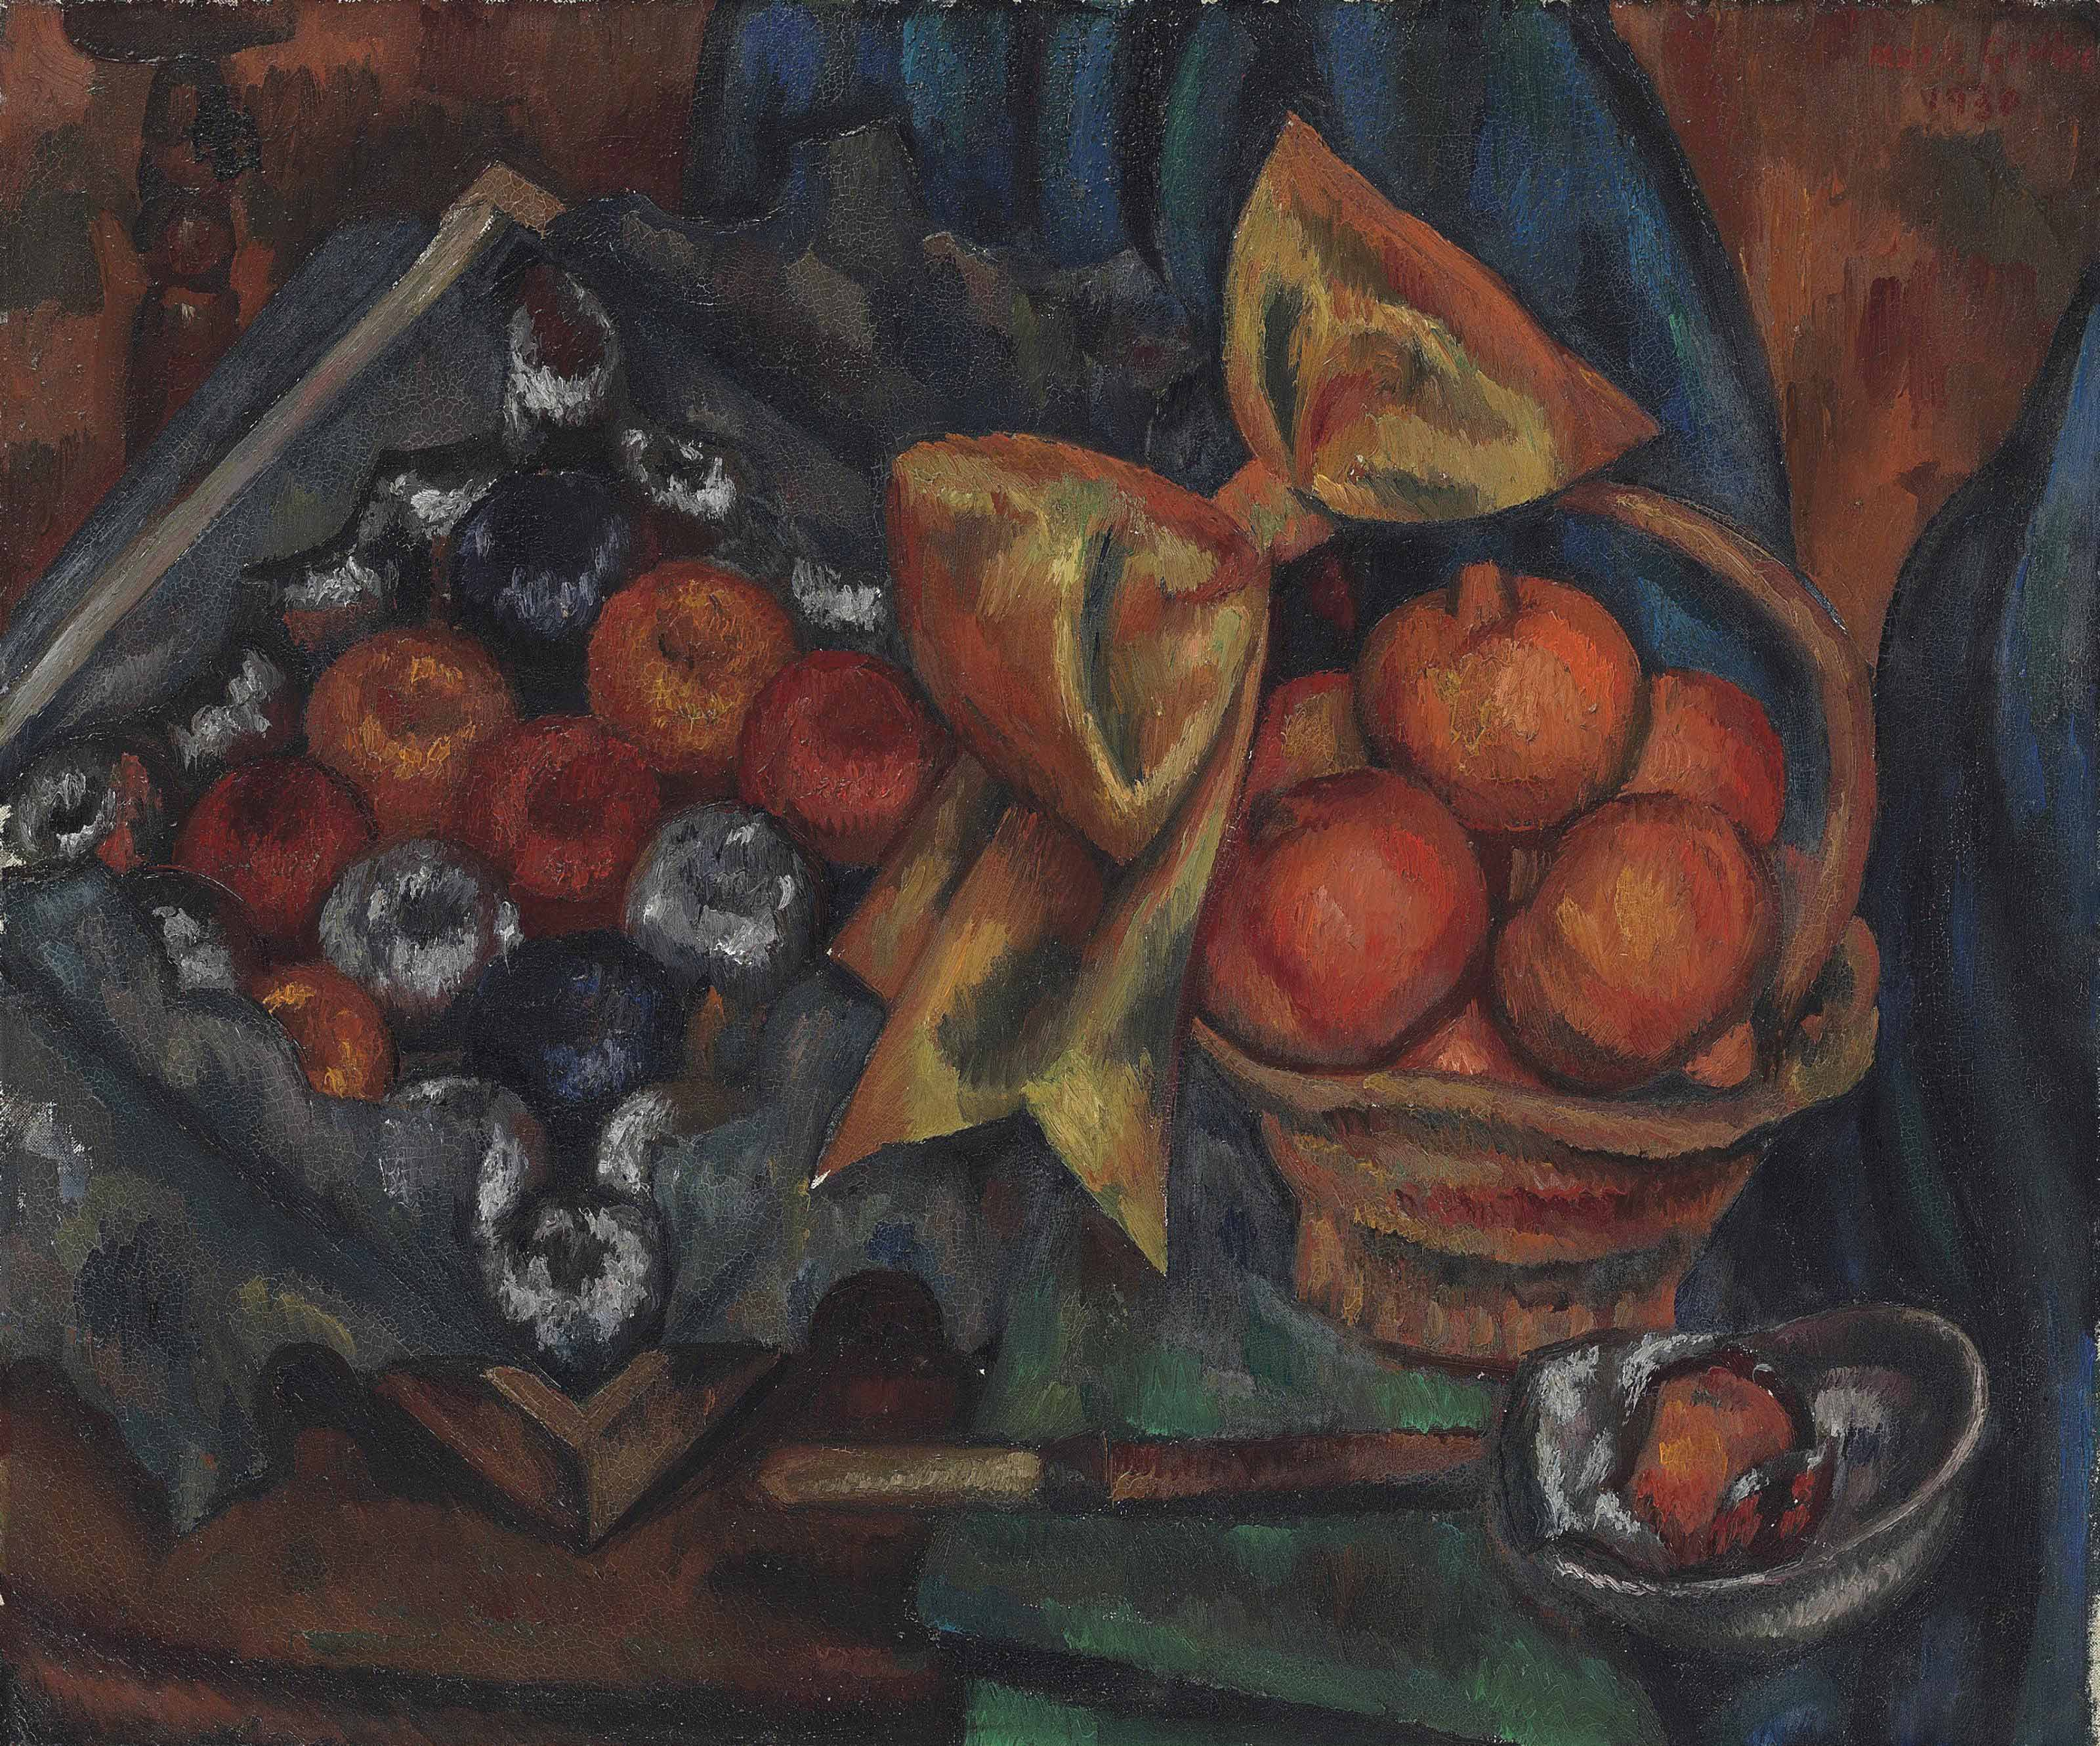 Still life with pomegranates and fruit